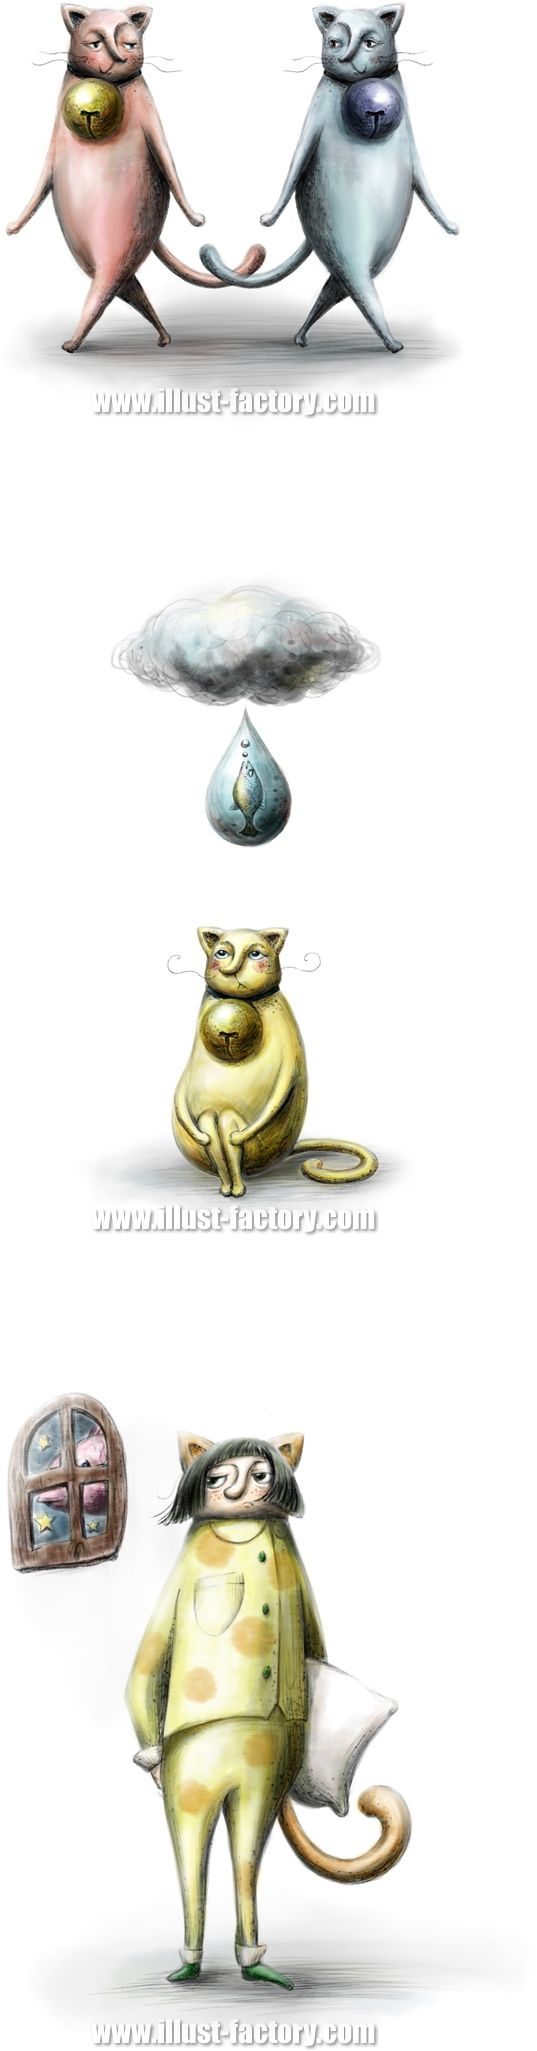 G312 絵本風 手描き猫イラスト制作例